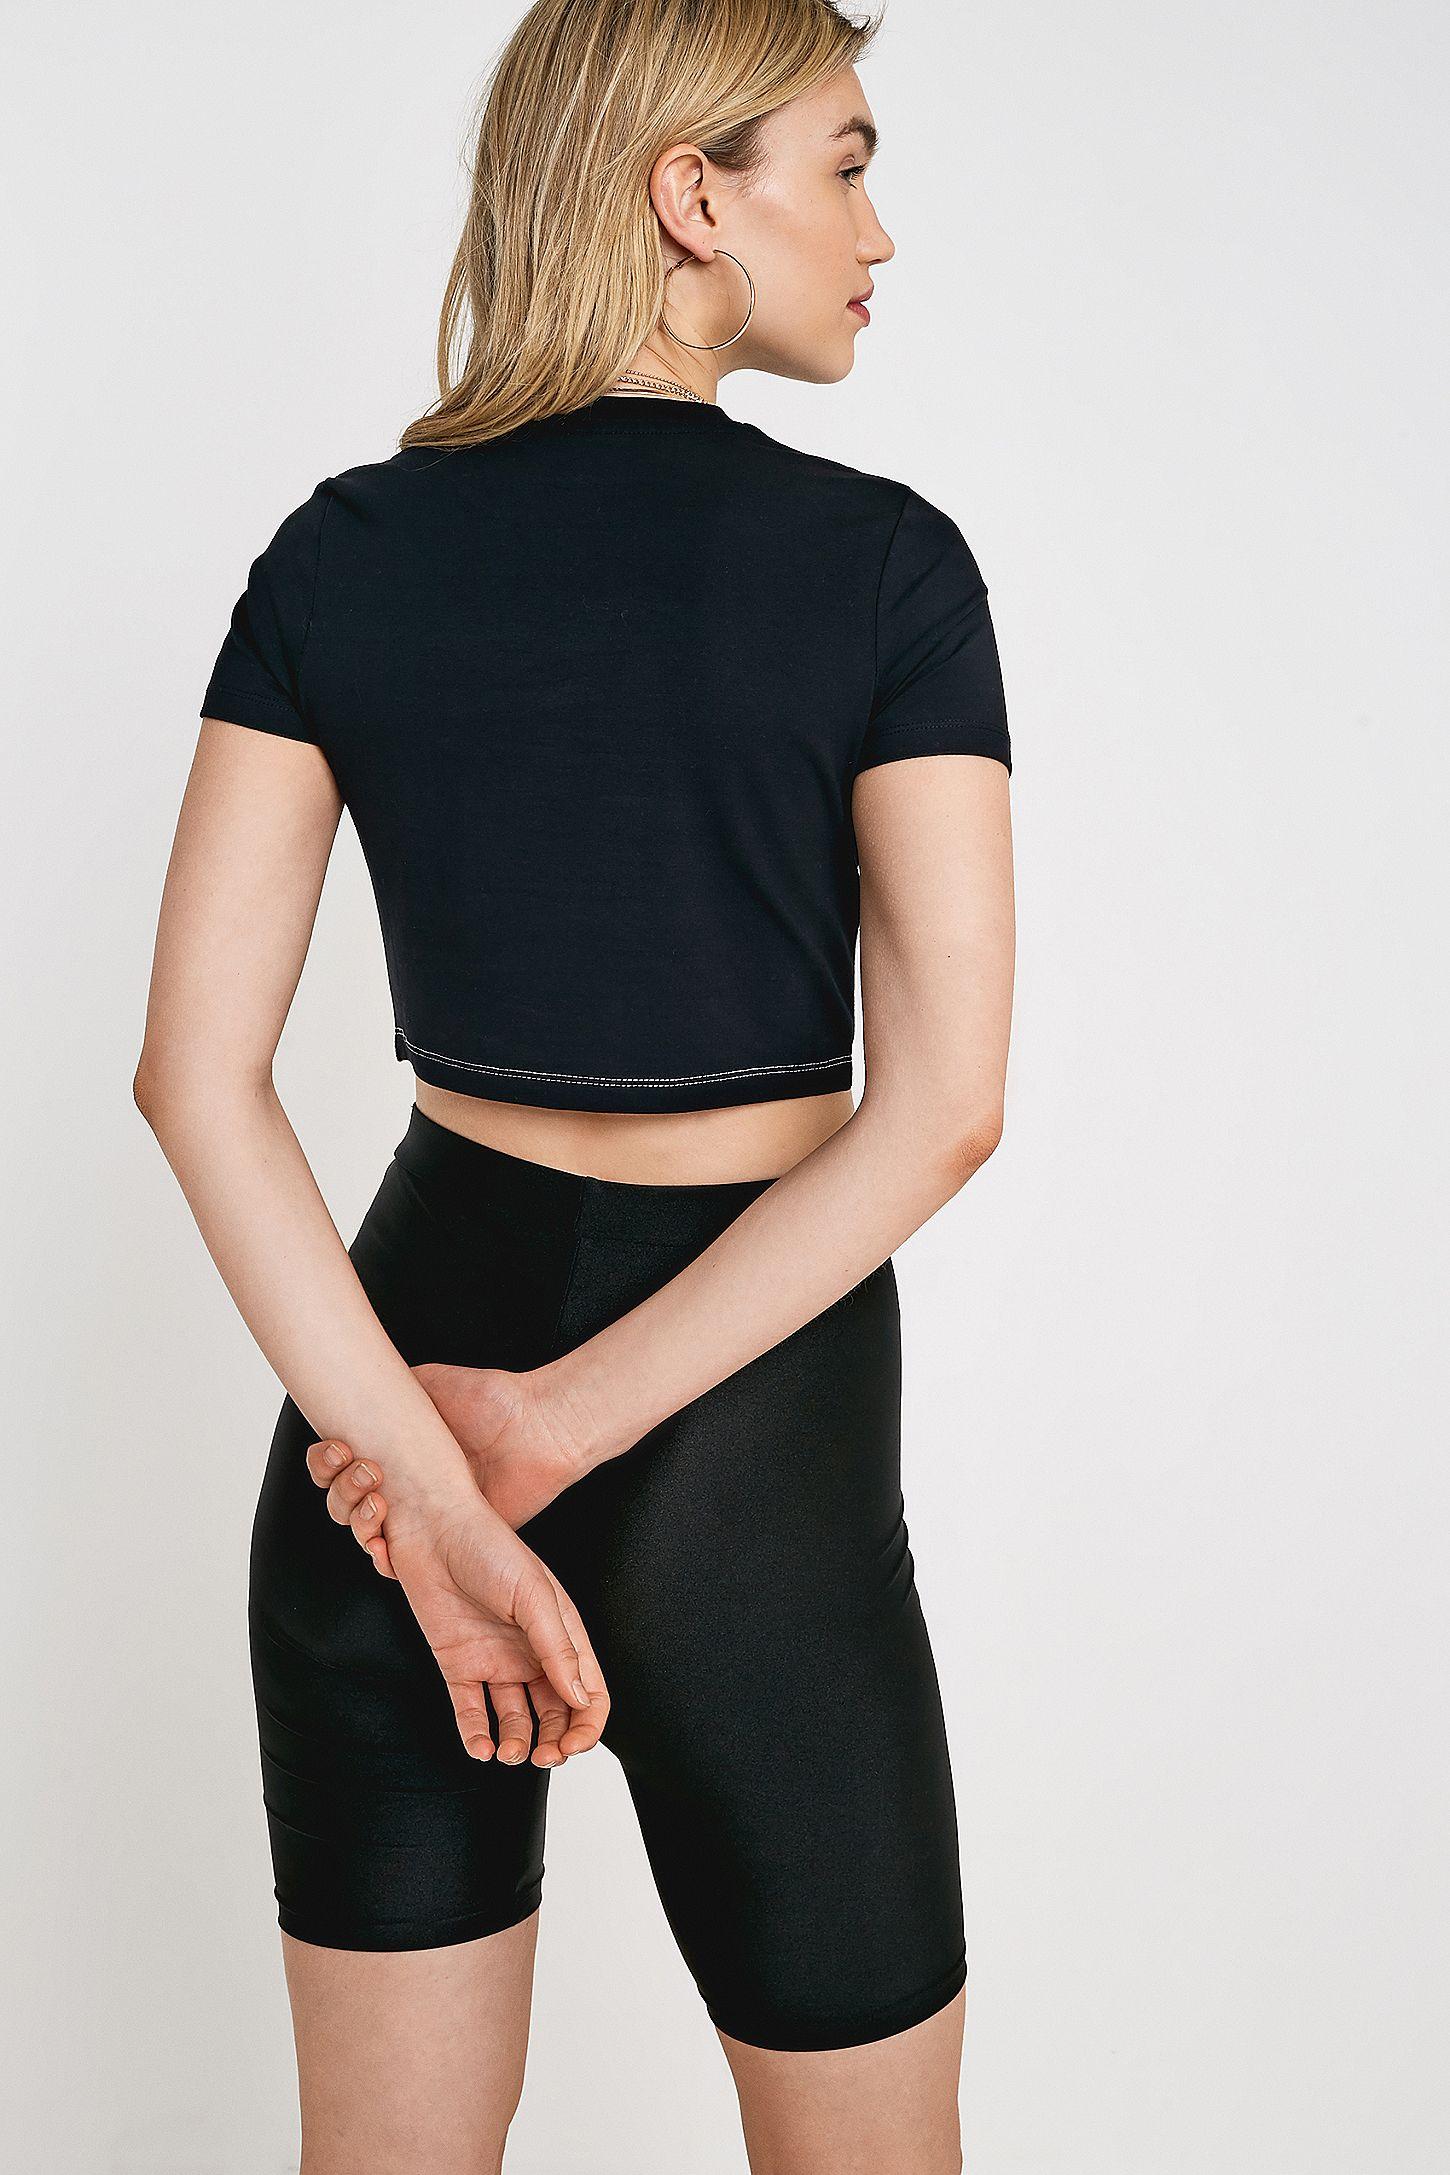 81907205c49b05 FILA Keyhole Crop T-Shirt | Urban Outfitters UK